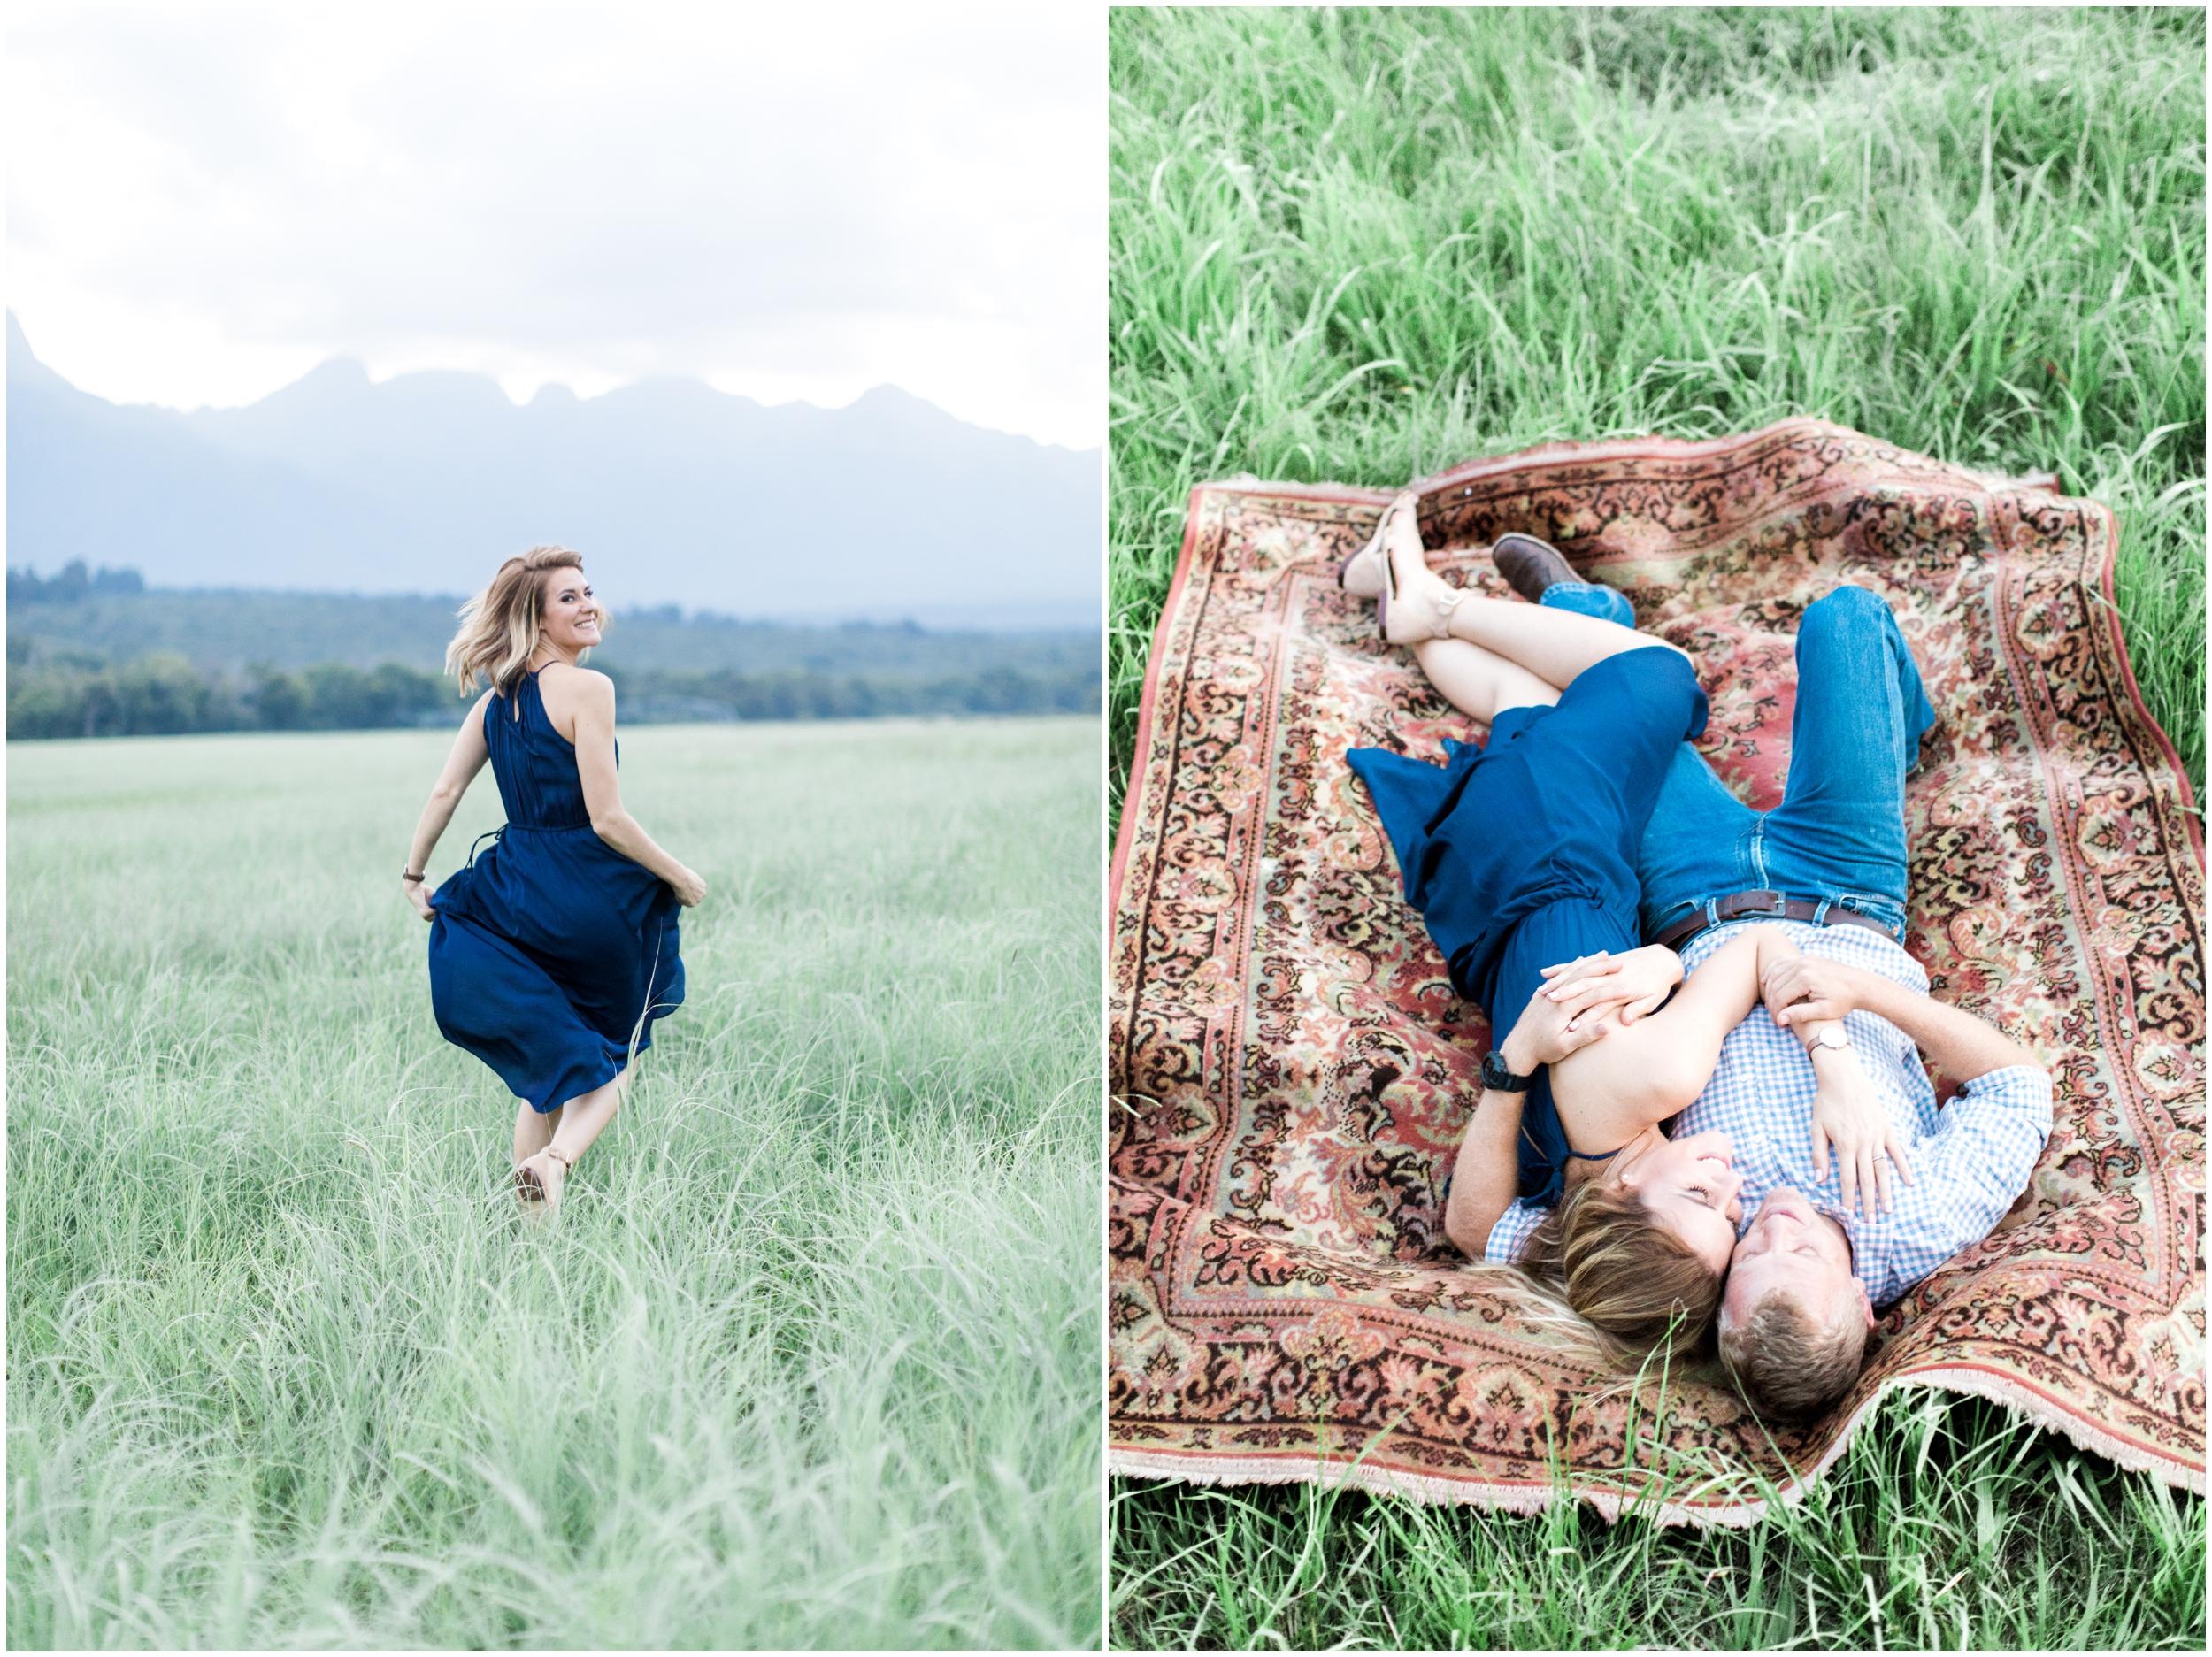 Yvette&Stefan00174.jpg